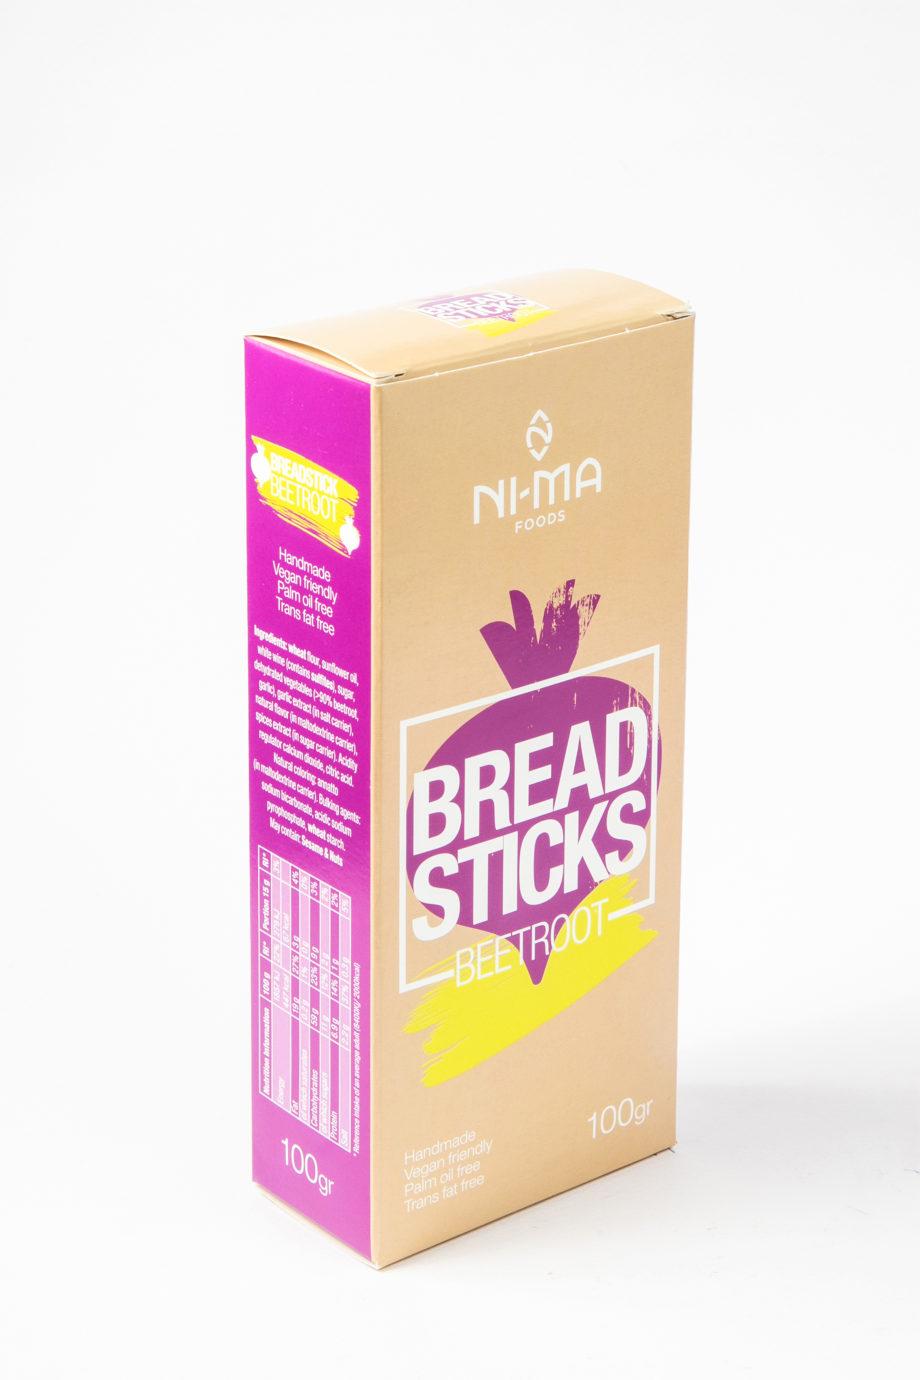 beetroot breadsticks box